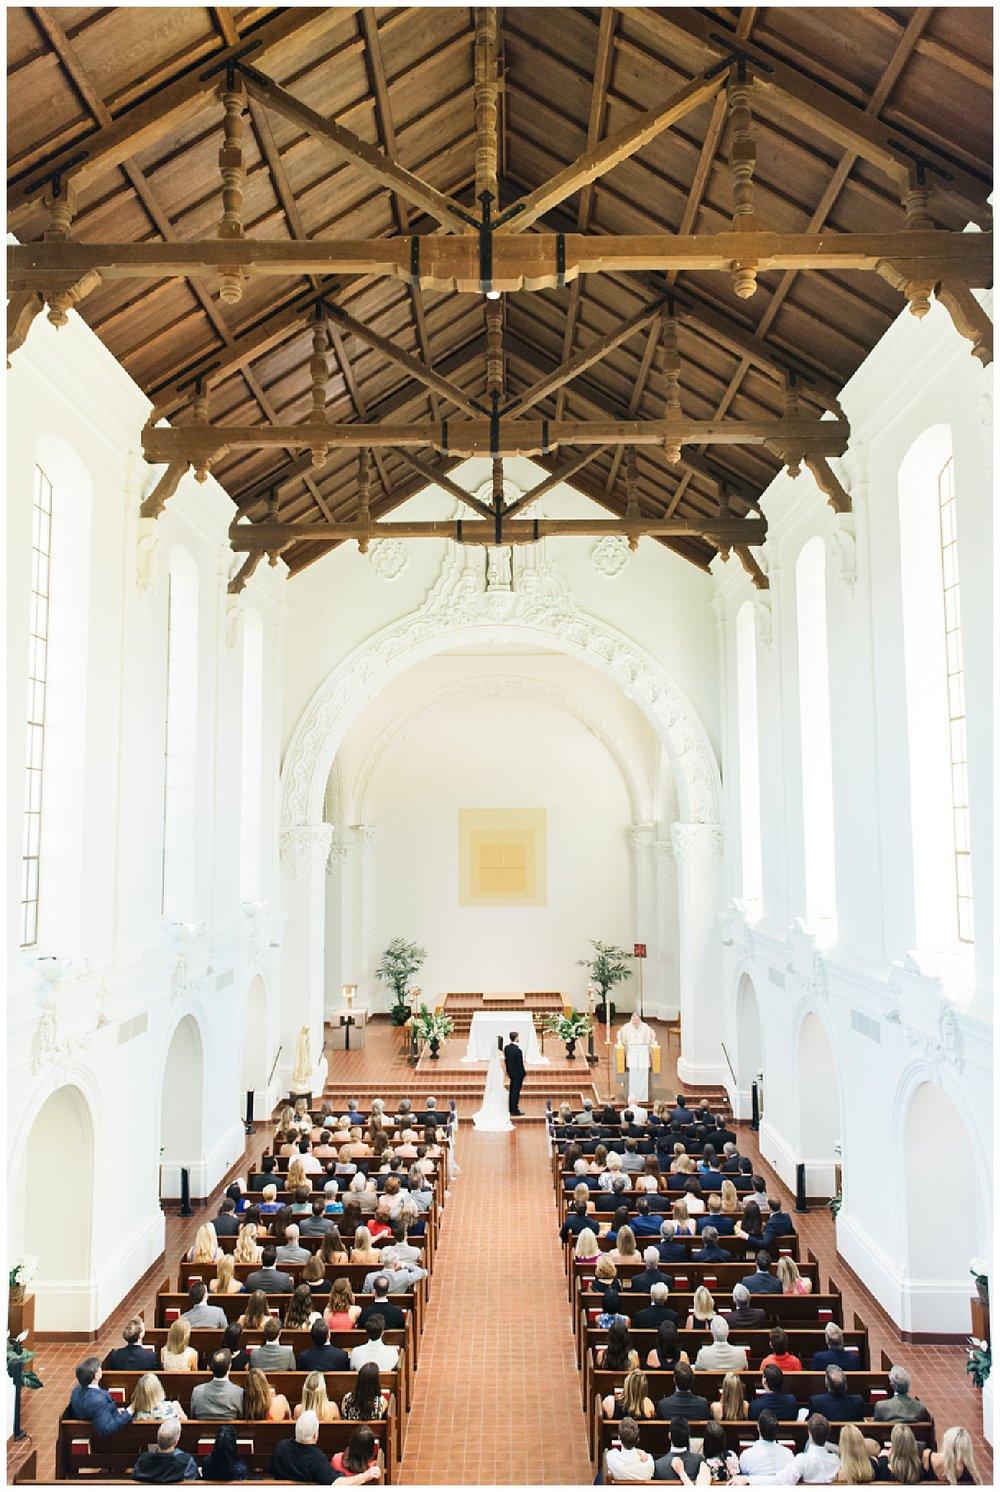 Janine_Licare_Photography_San_Francisco_Wedding_Photographer_0151.jpg